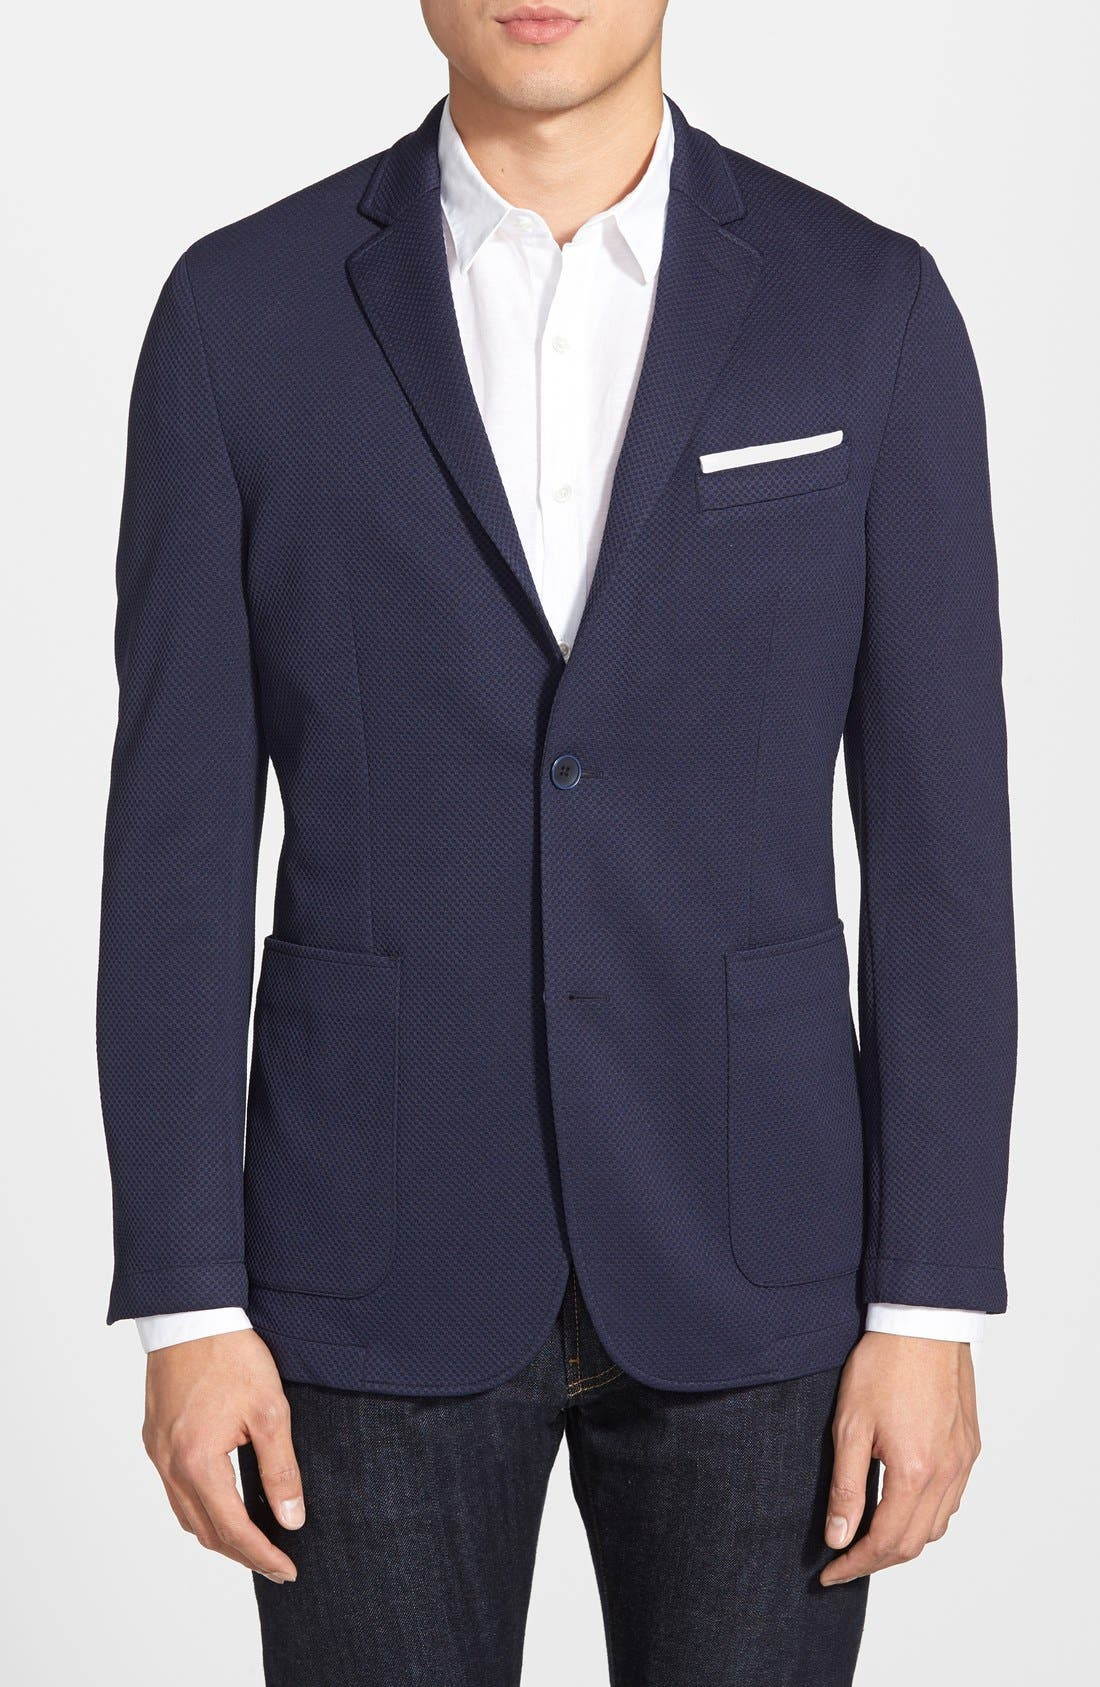 Alternate Image 1 Selected - Vince Camuto Slim Fit Stretch Knit Blazer